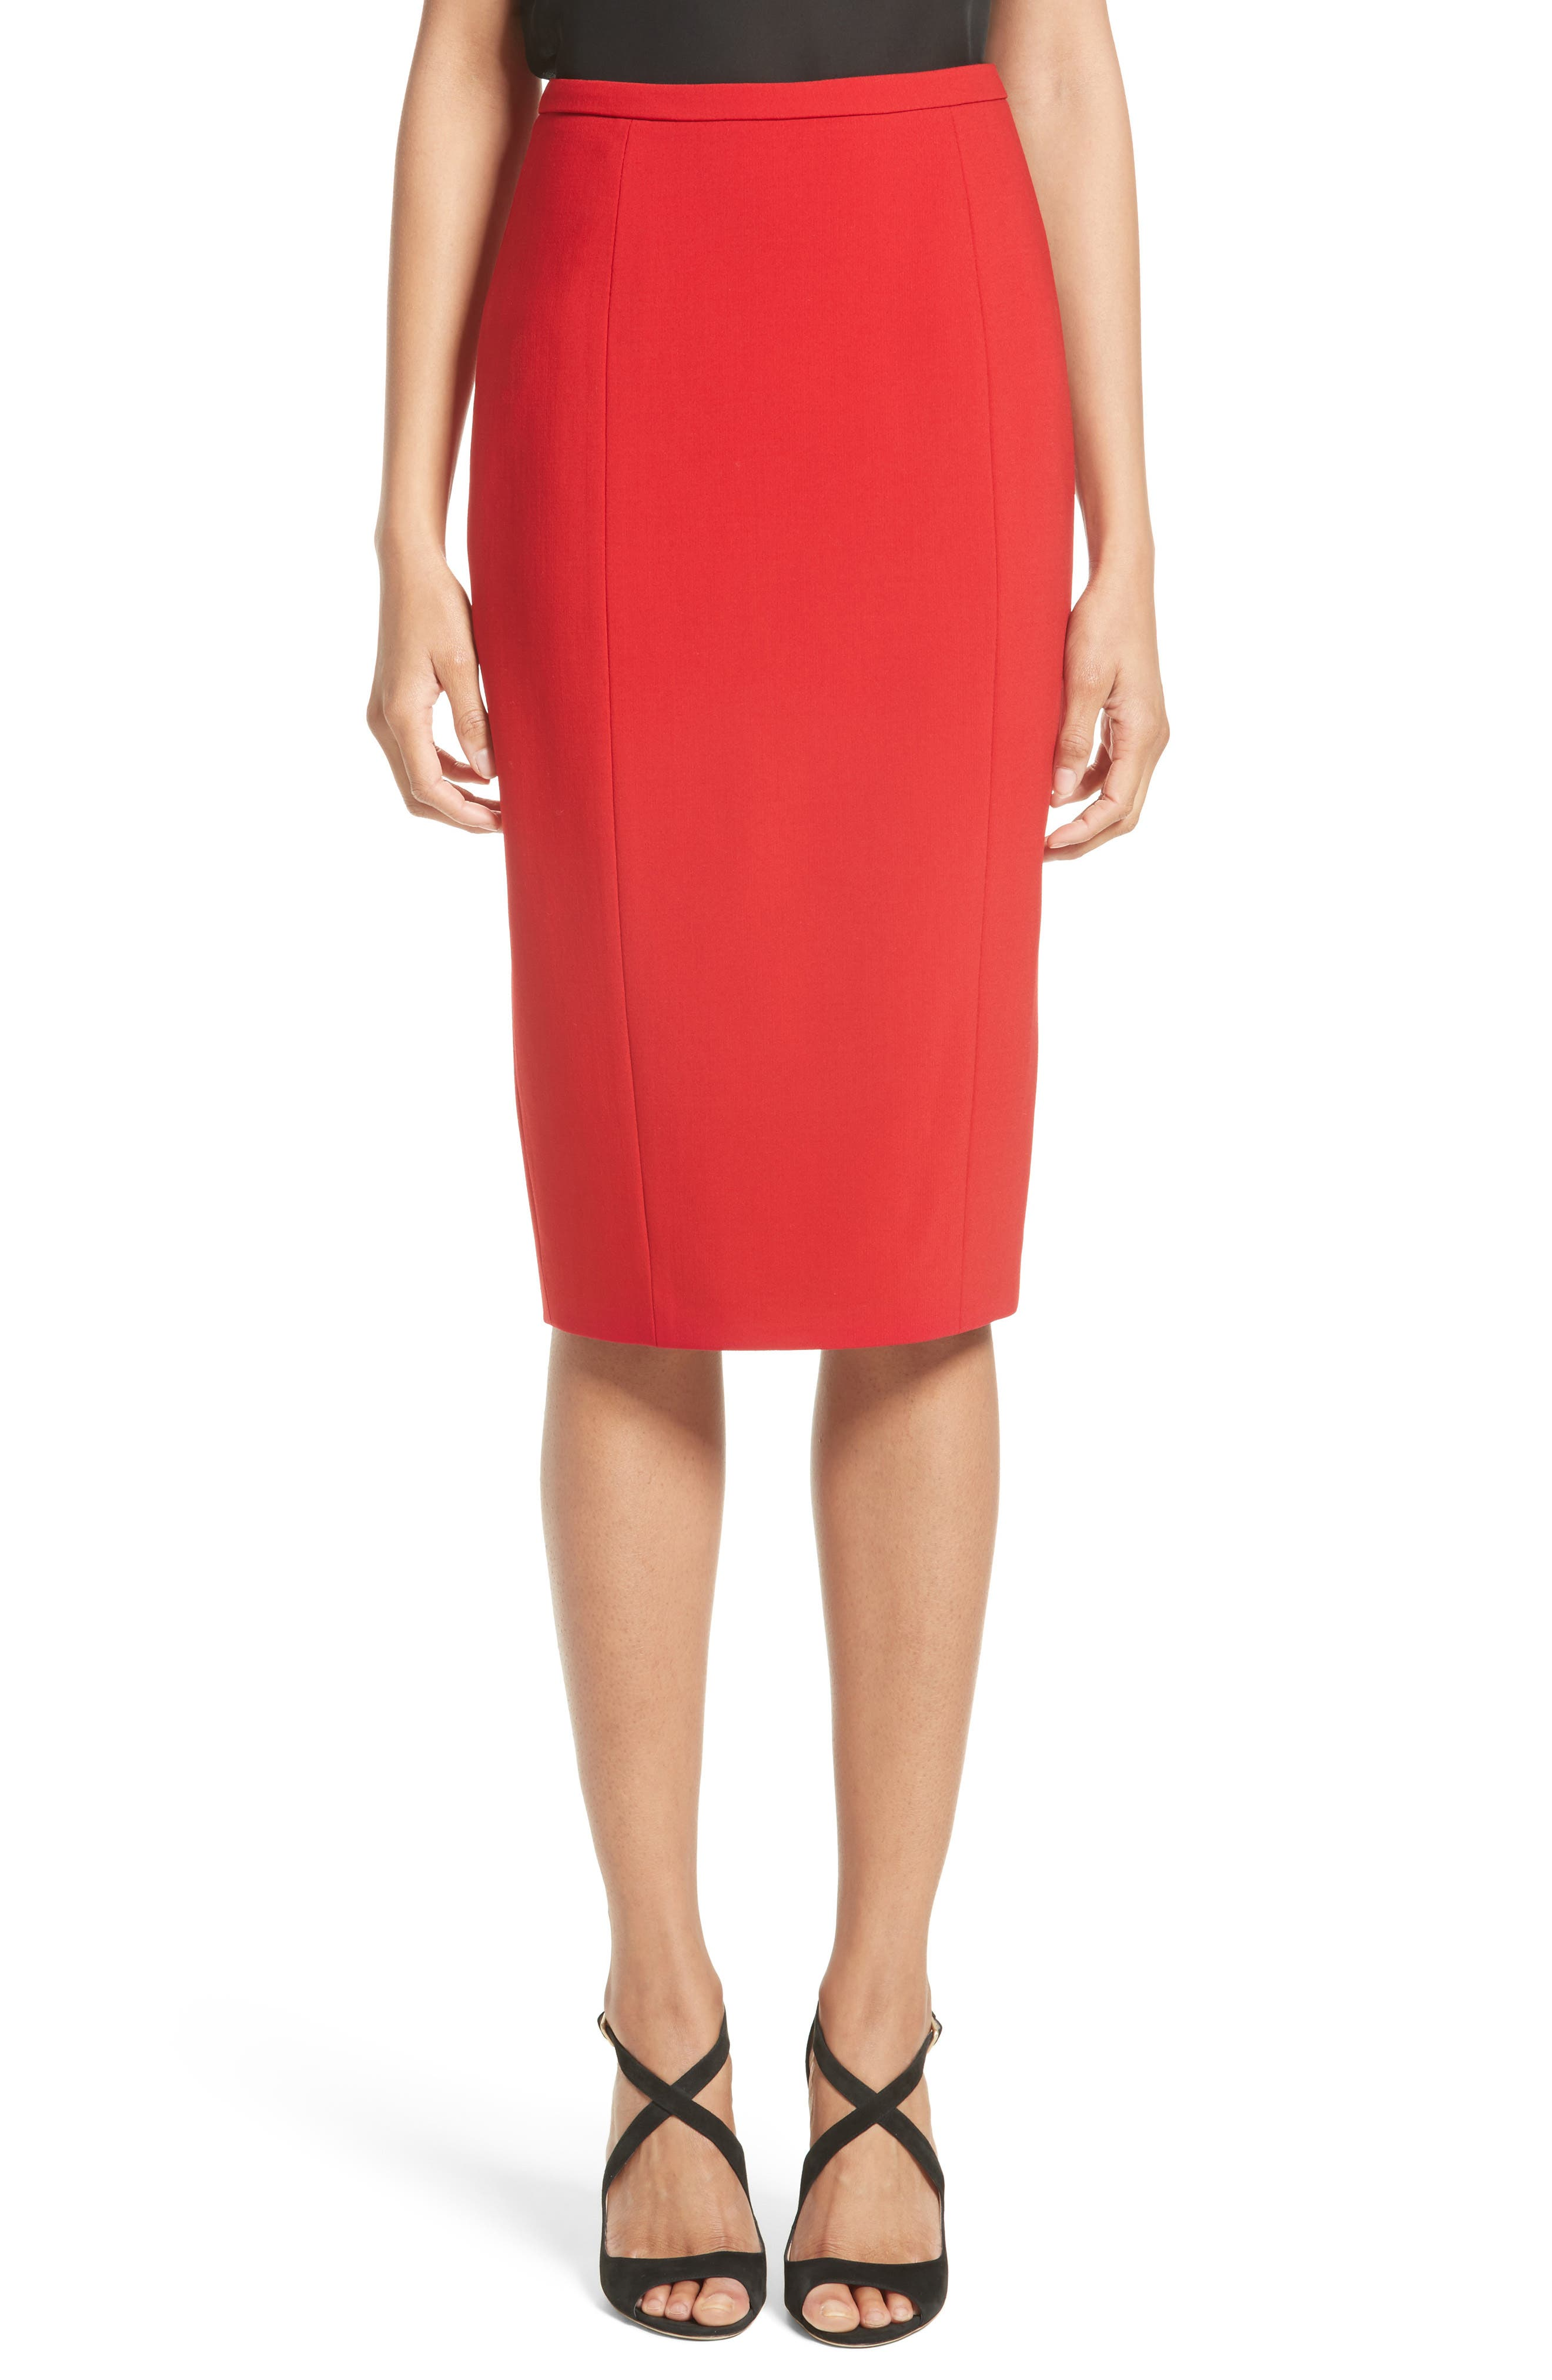 Michael Kors Stretch Pebble Crepe Pencil Skirt